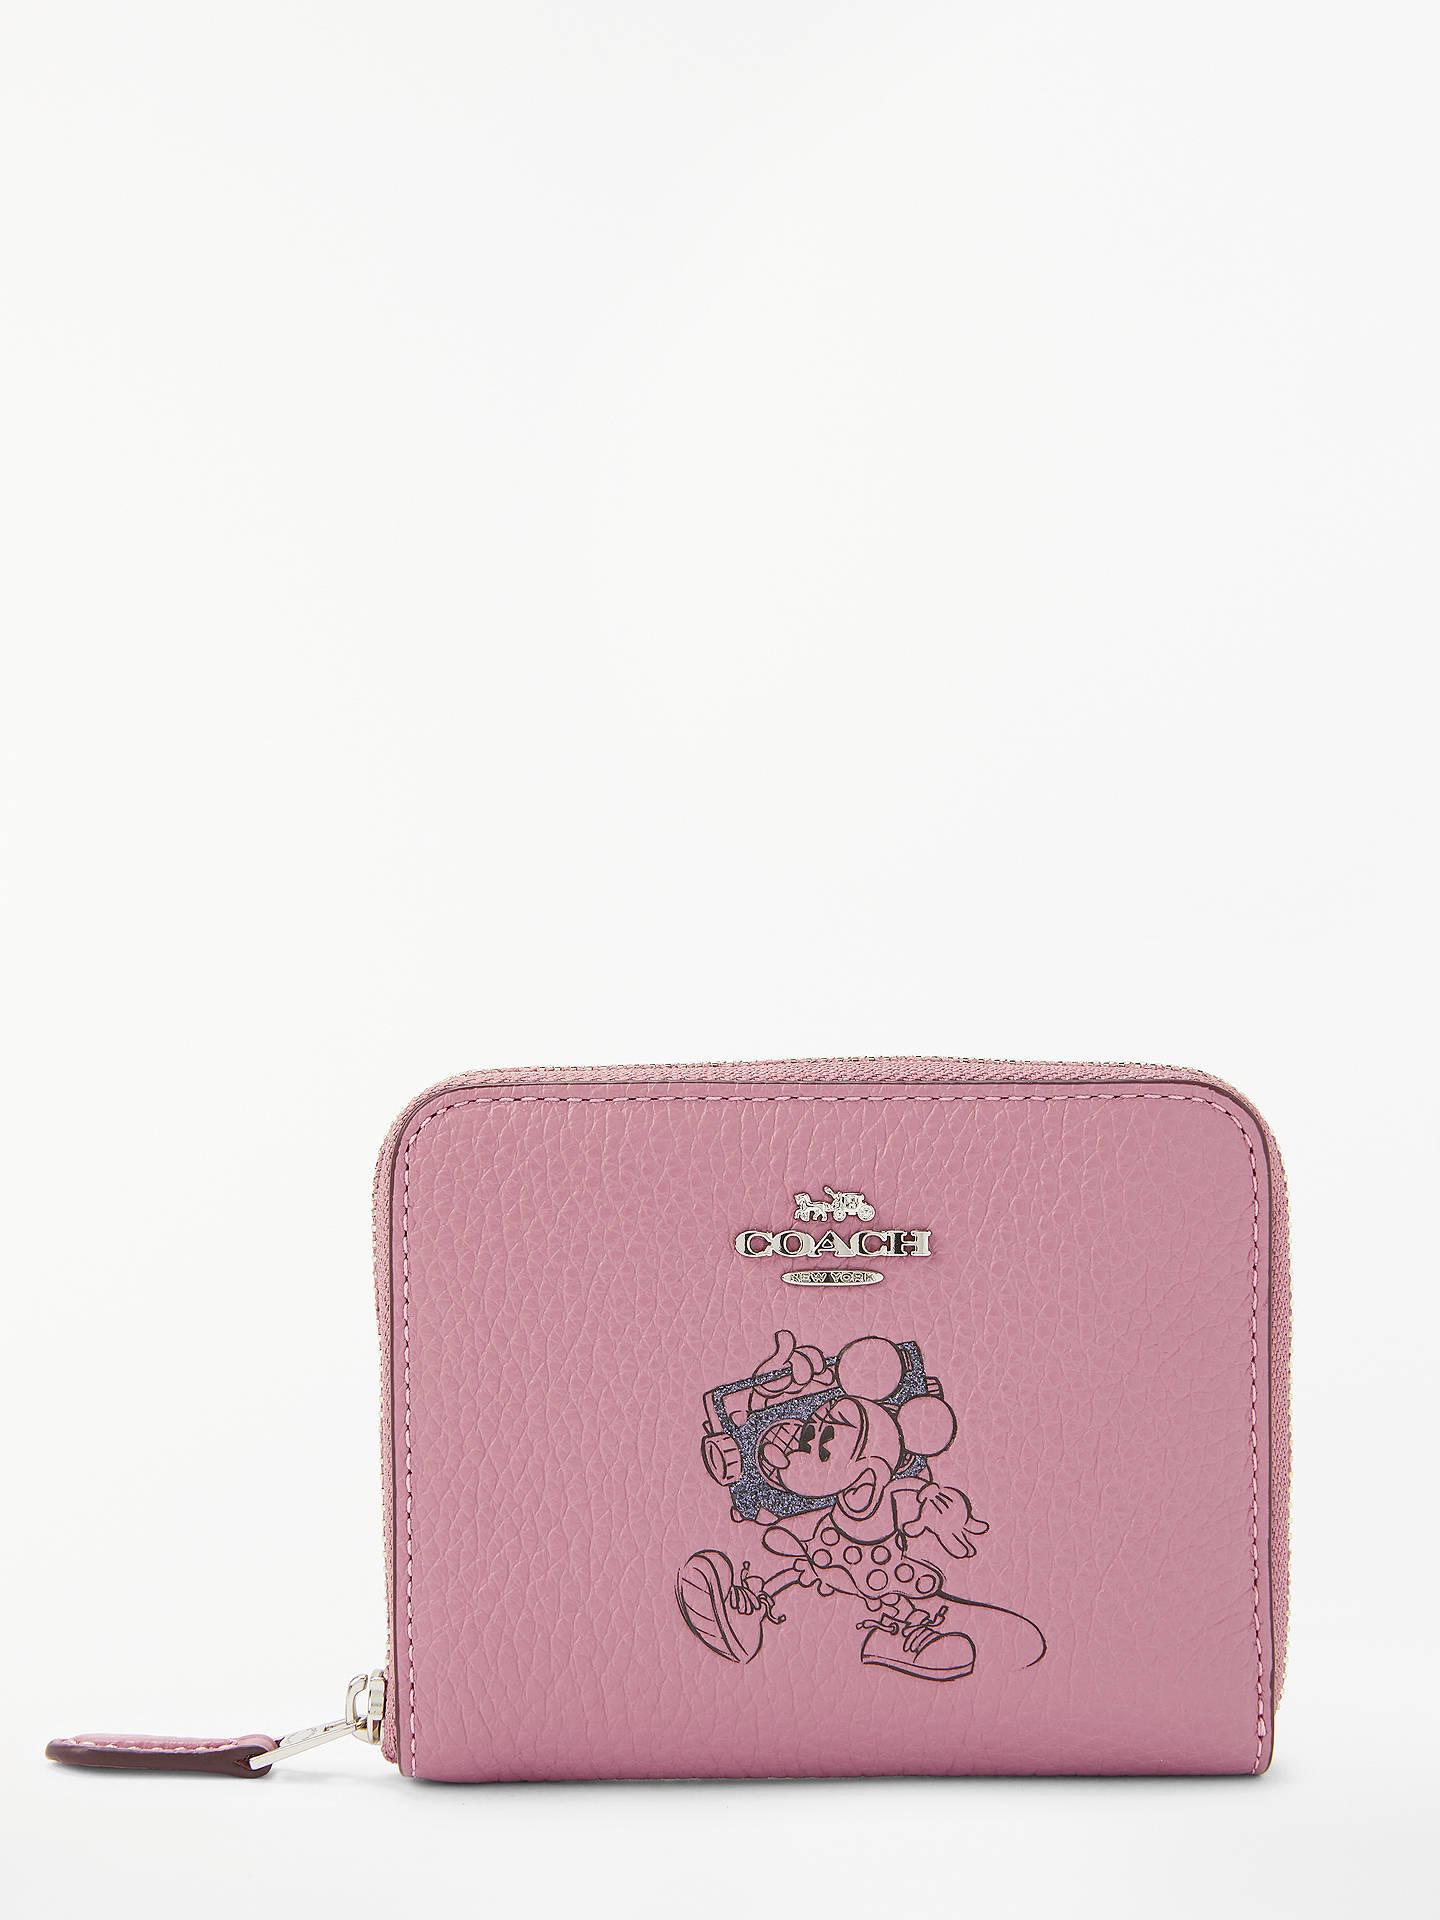 2fa65058e746 Disney x Coach Minnie Small Leather Zip Around Purse at John Lewis ...